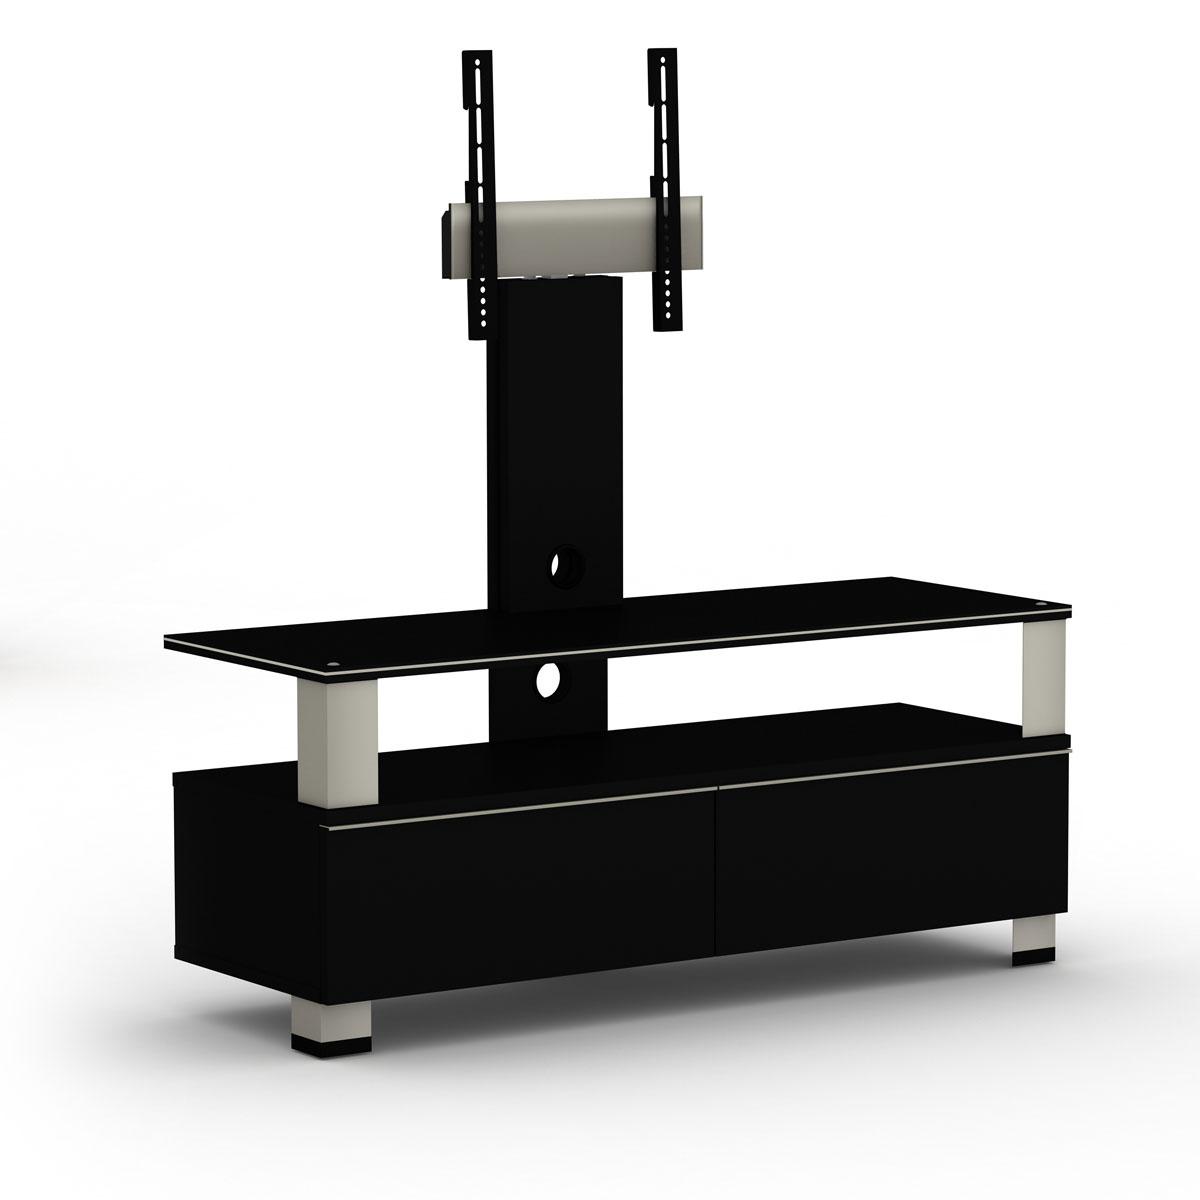 Elmob tura tu 120 02f noir meuble tv elmob sur ldlc - Meuble support tv ecran plat ...